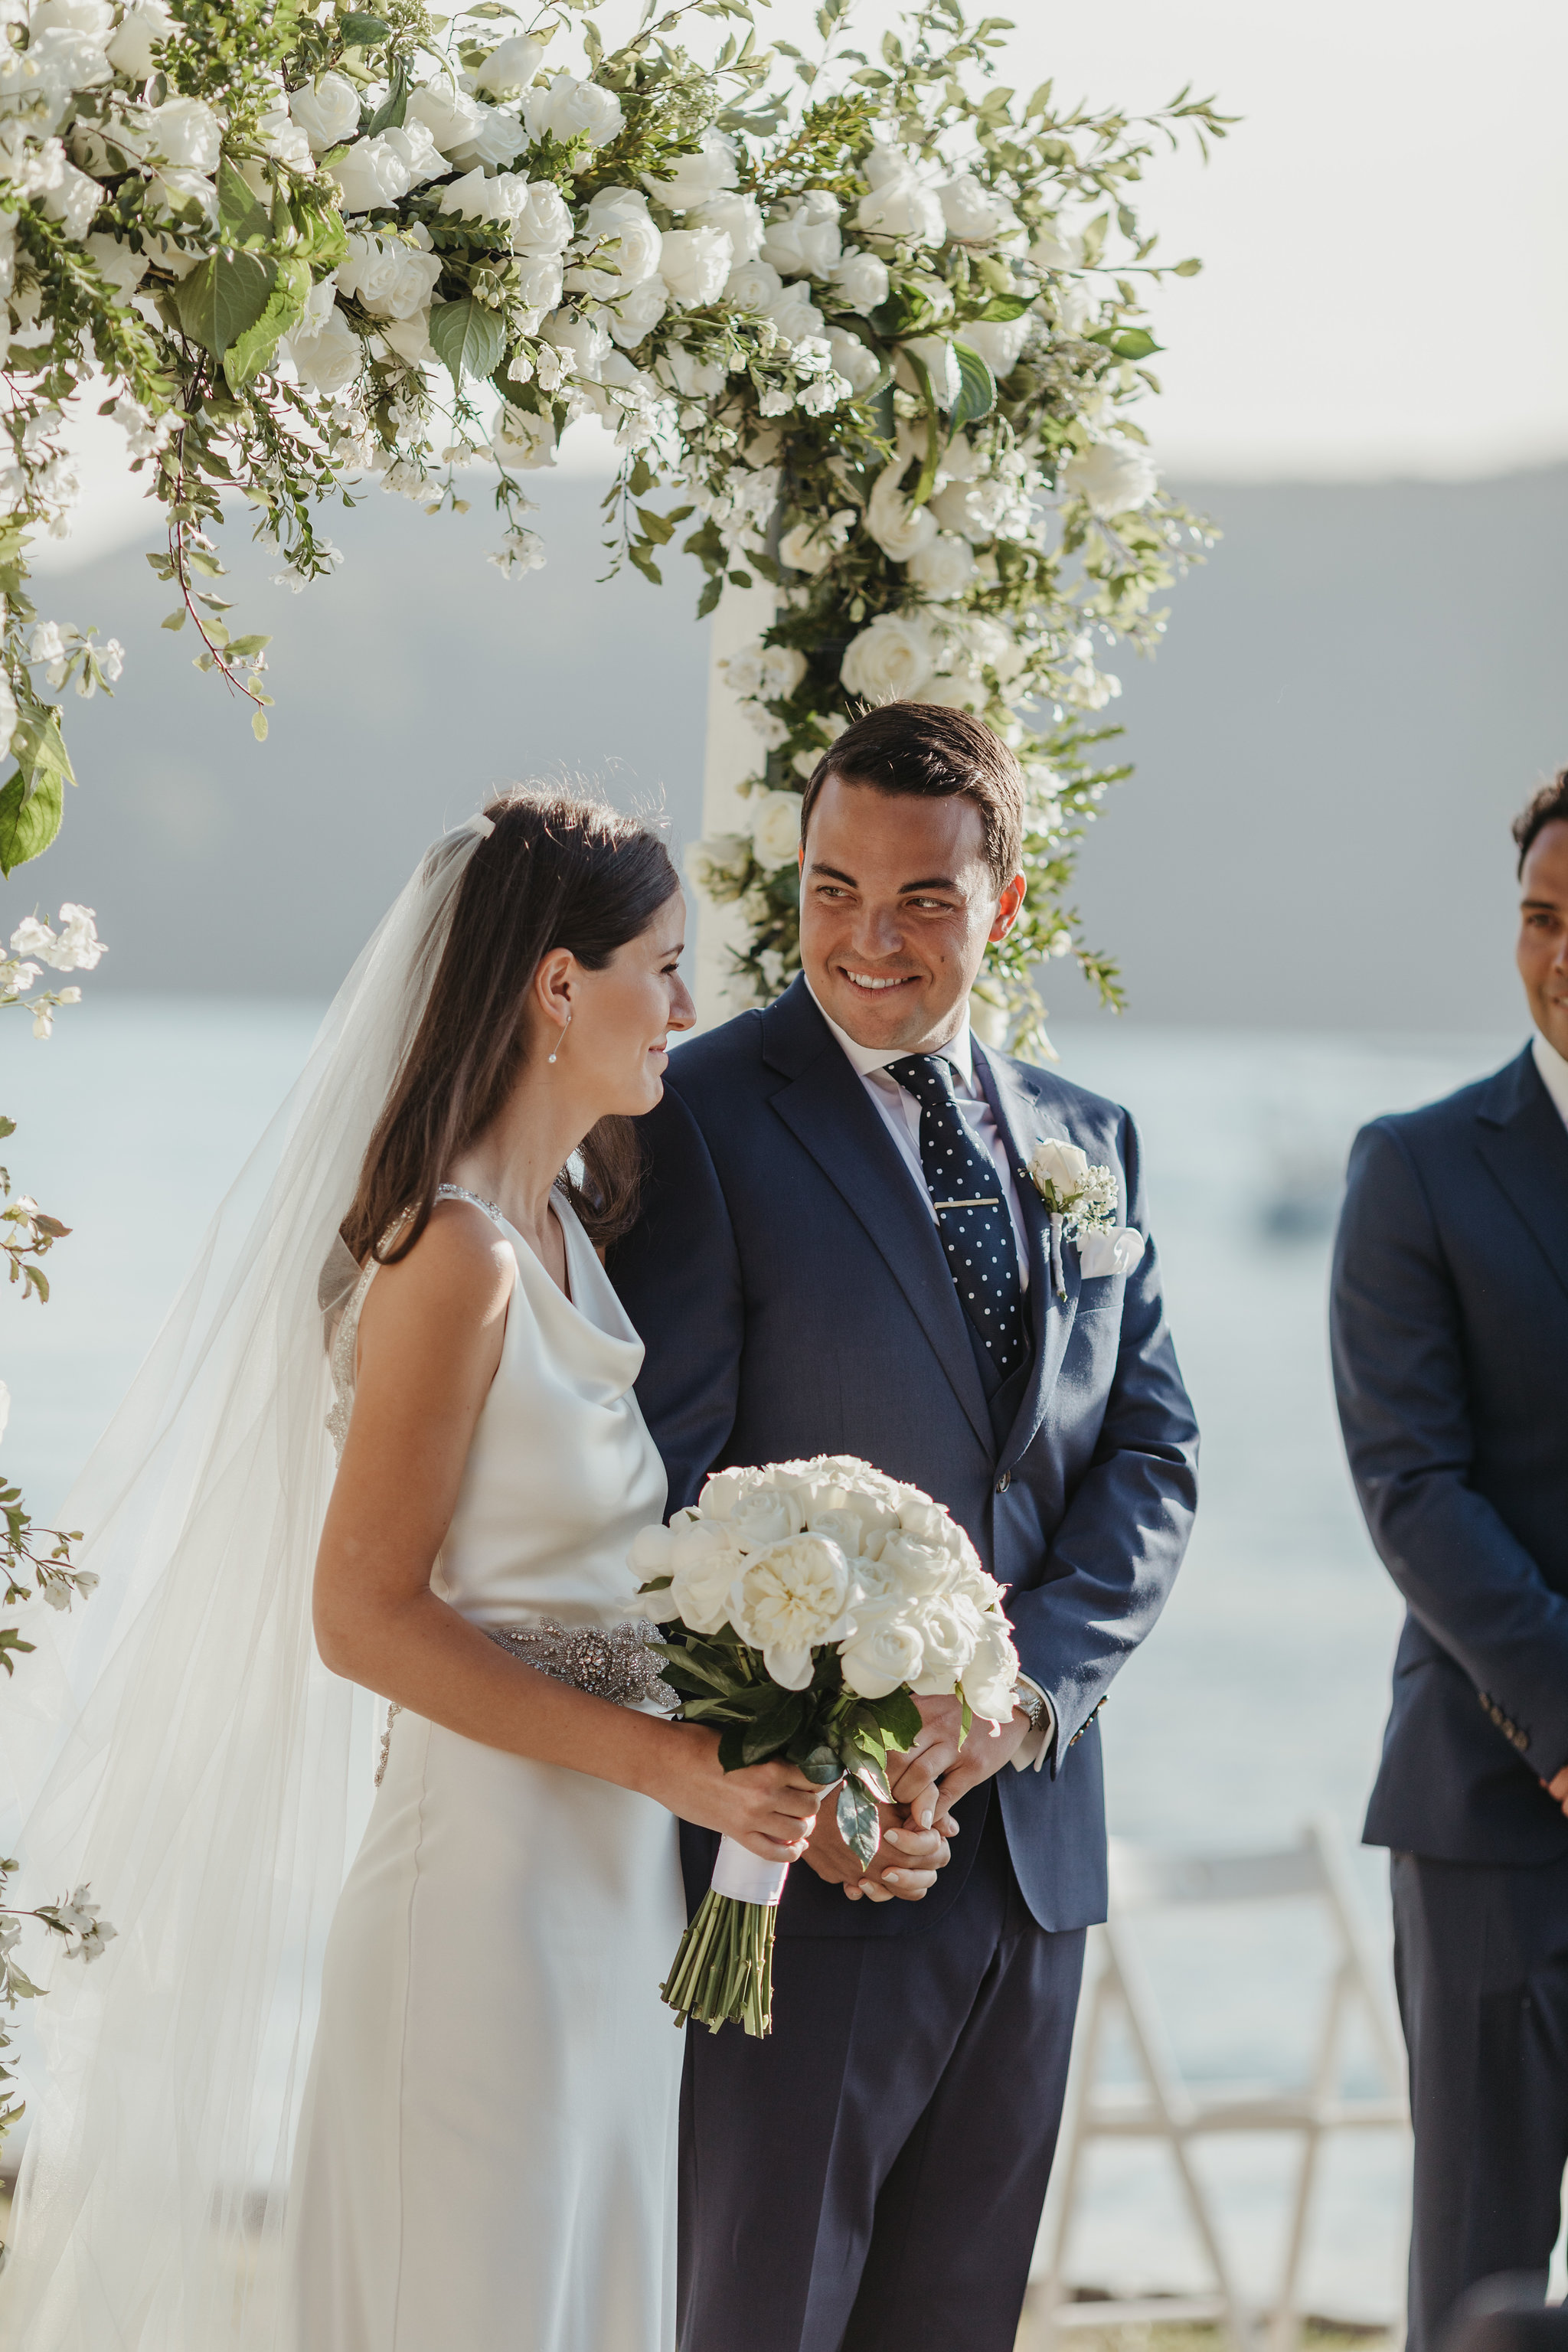 gen_chris_story_of_us_wedding-0275.JPG